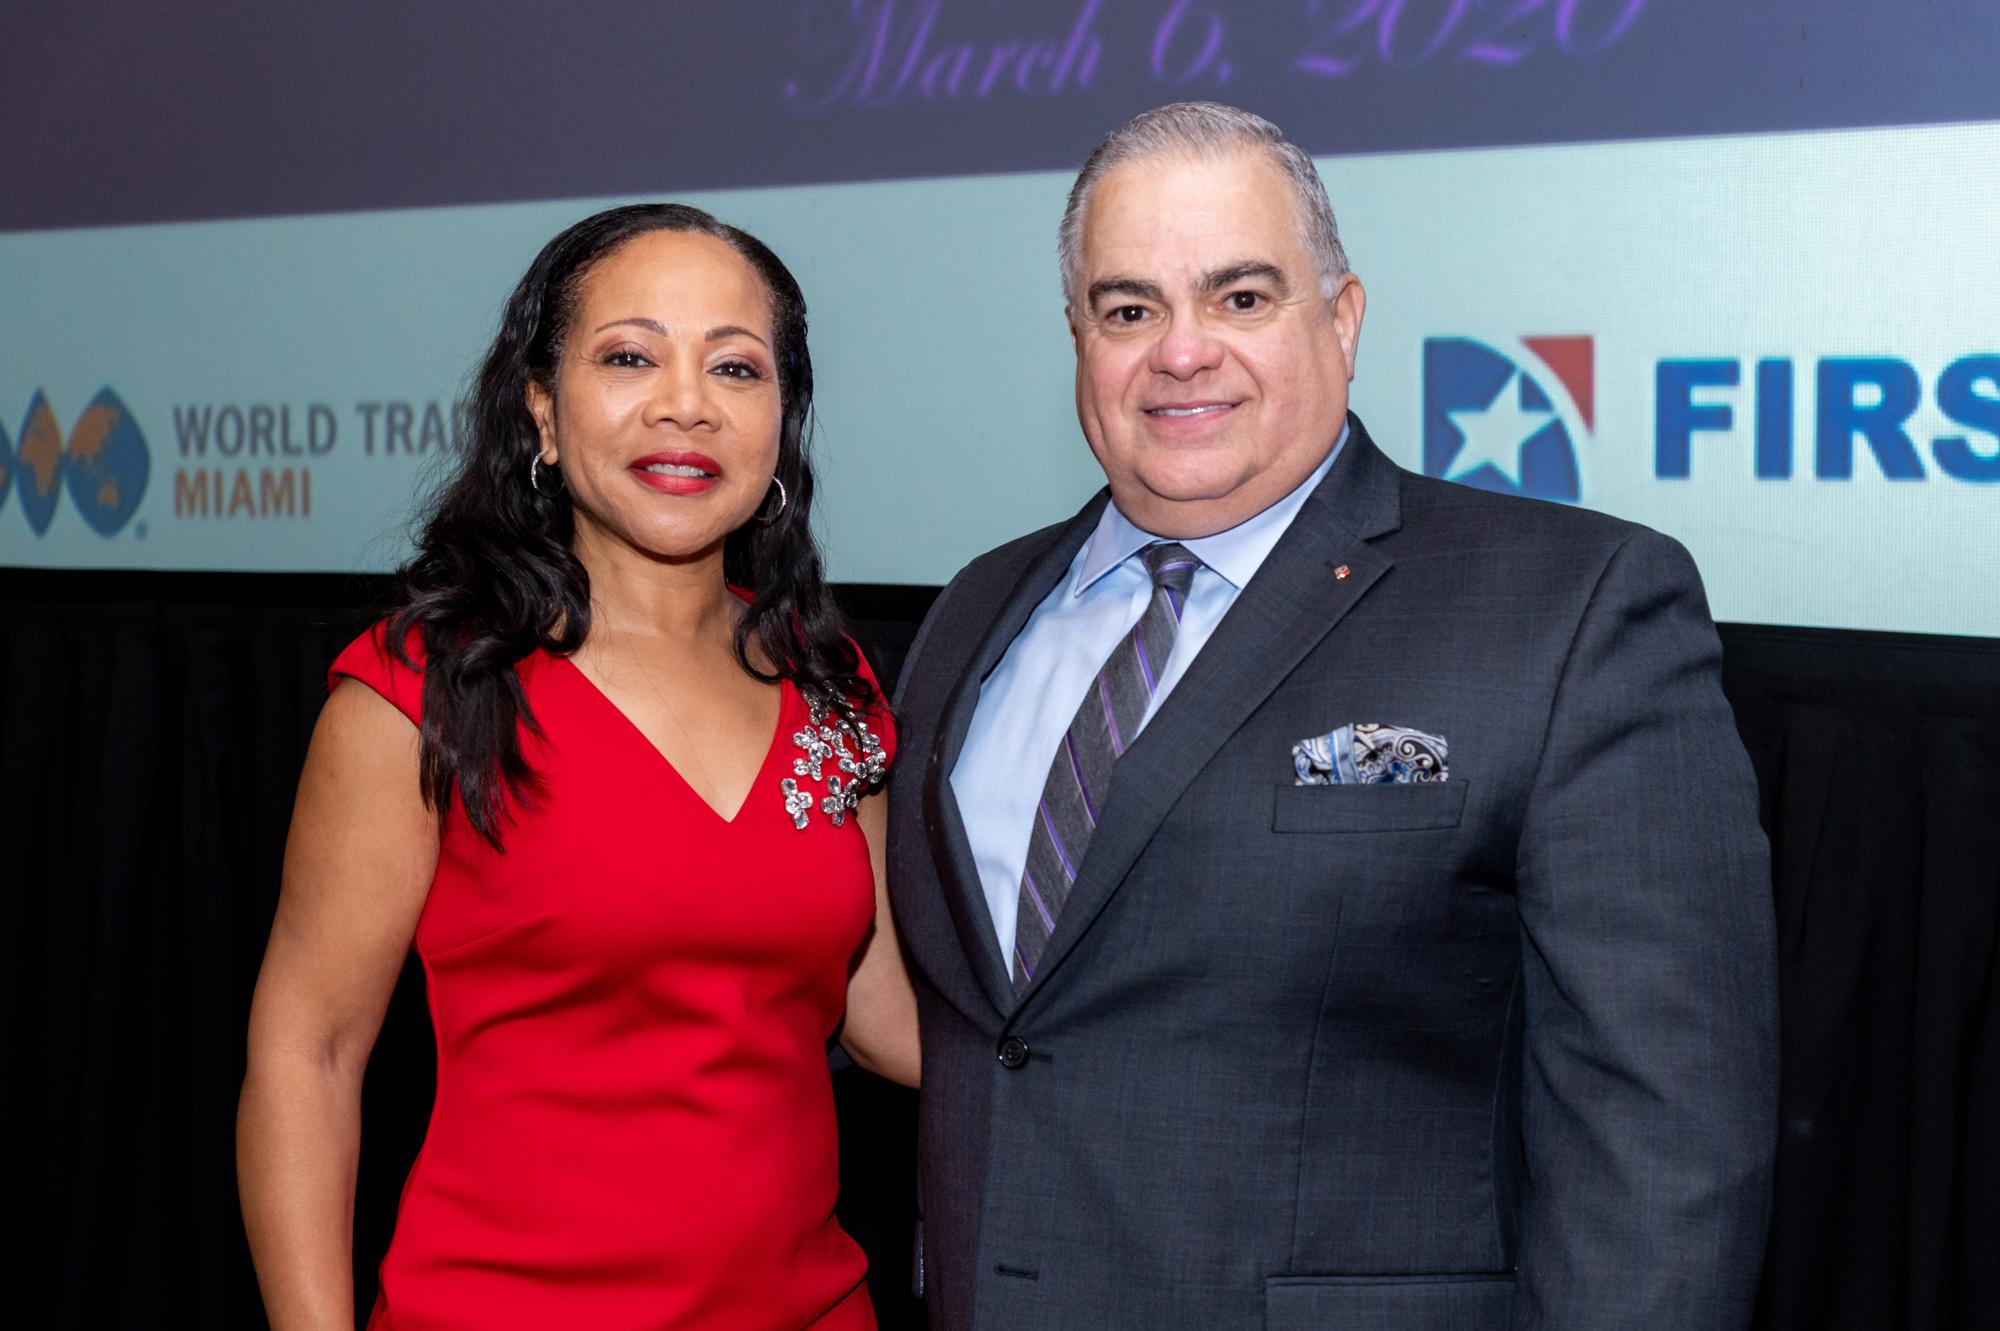 Roberto and Teresa Foxx